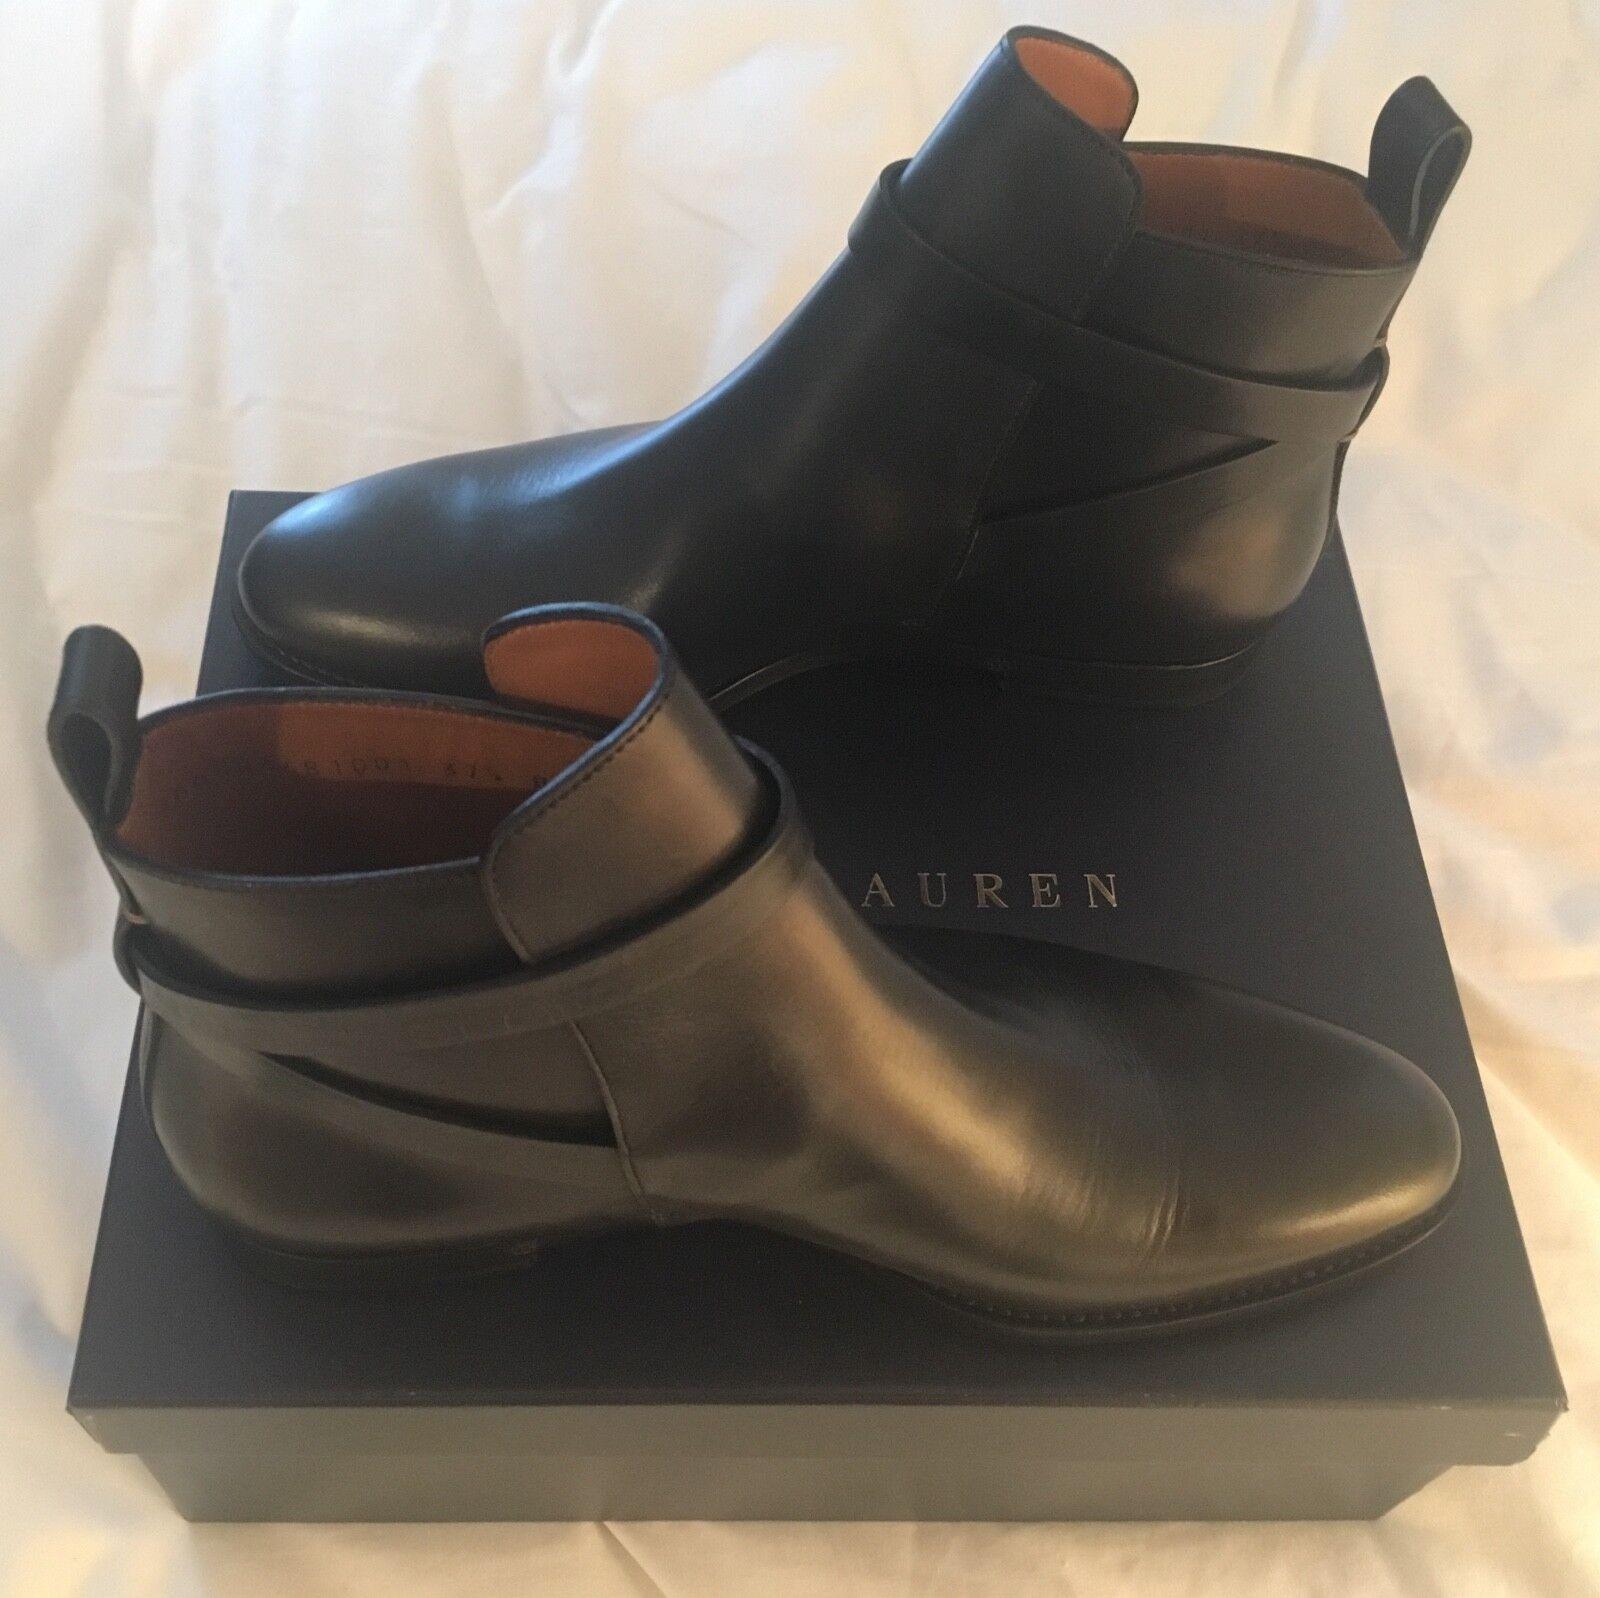 BRAND NEW   Ralph Lauren Salem Leather Boot Size 7.5